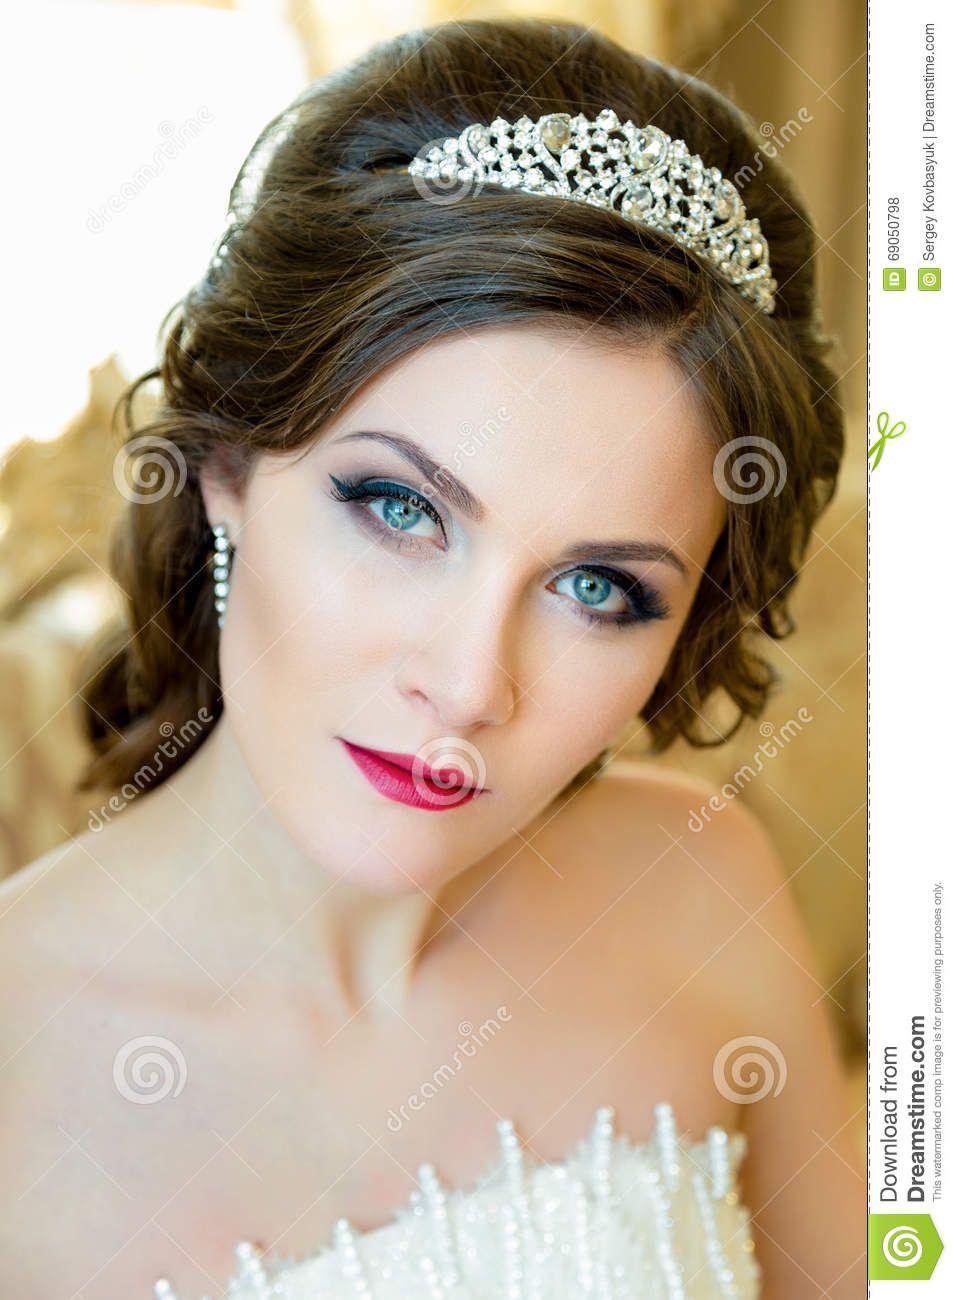 Wedding Makeup Wedding Make-Up Wedding Makeup Ideas